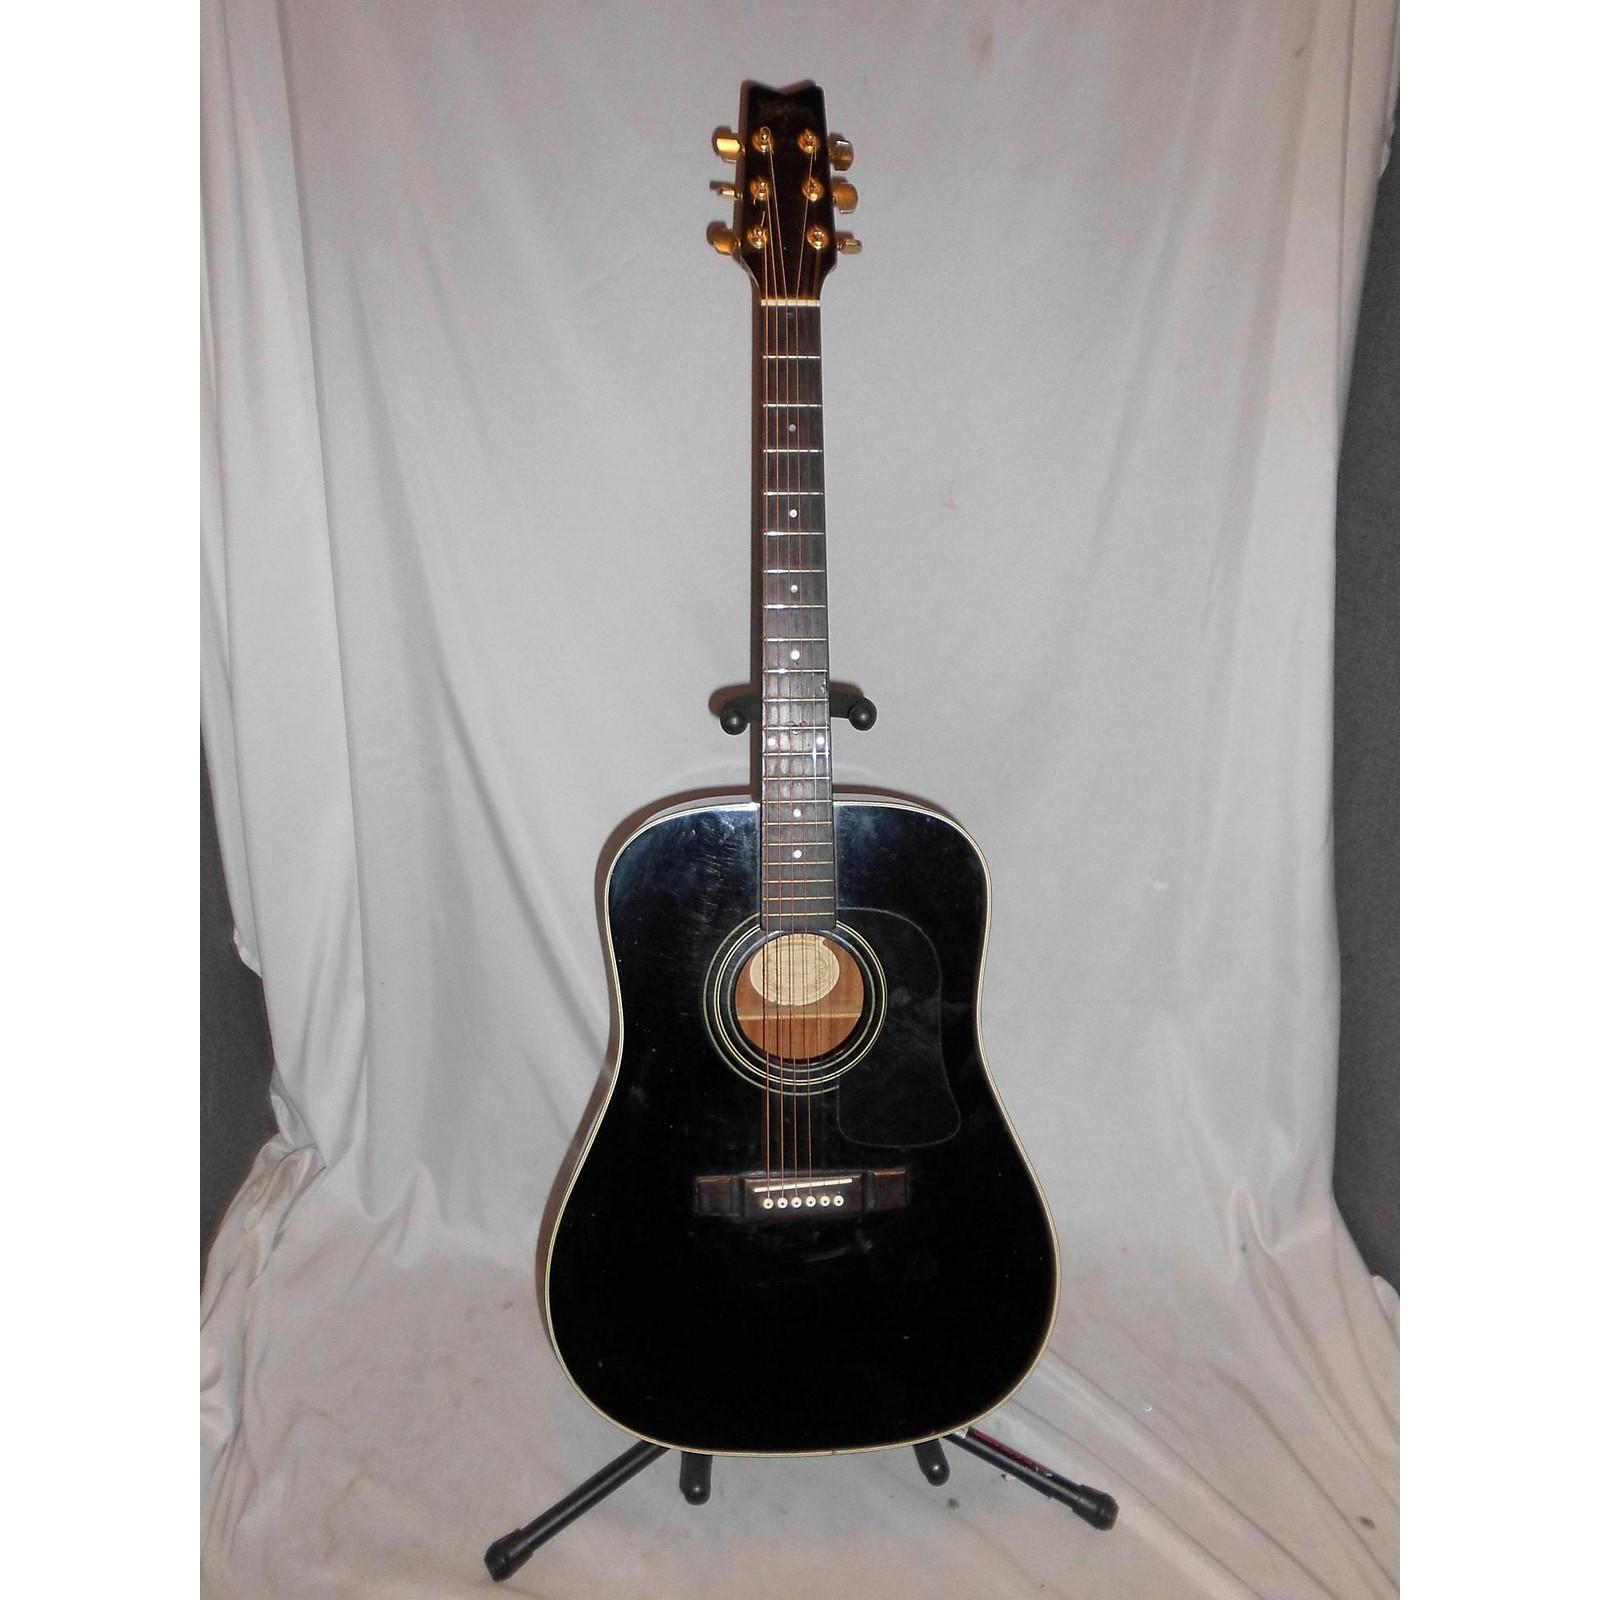 Washburn D100b Solid Body Electric Guitar